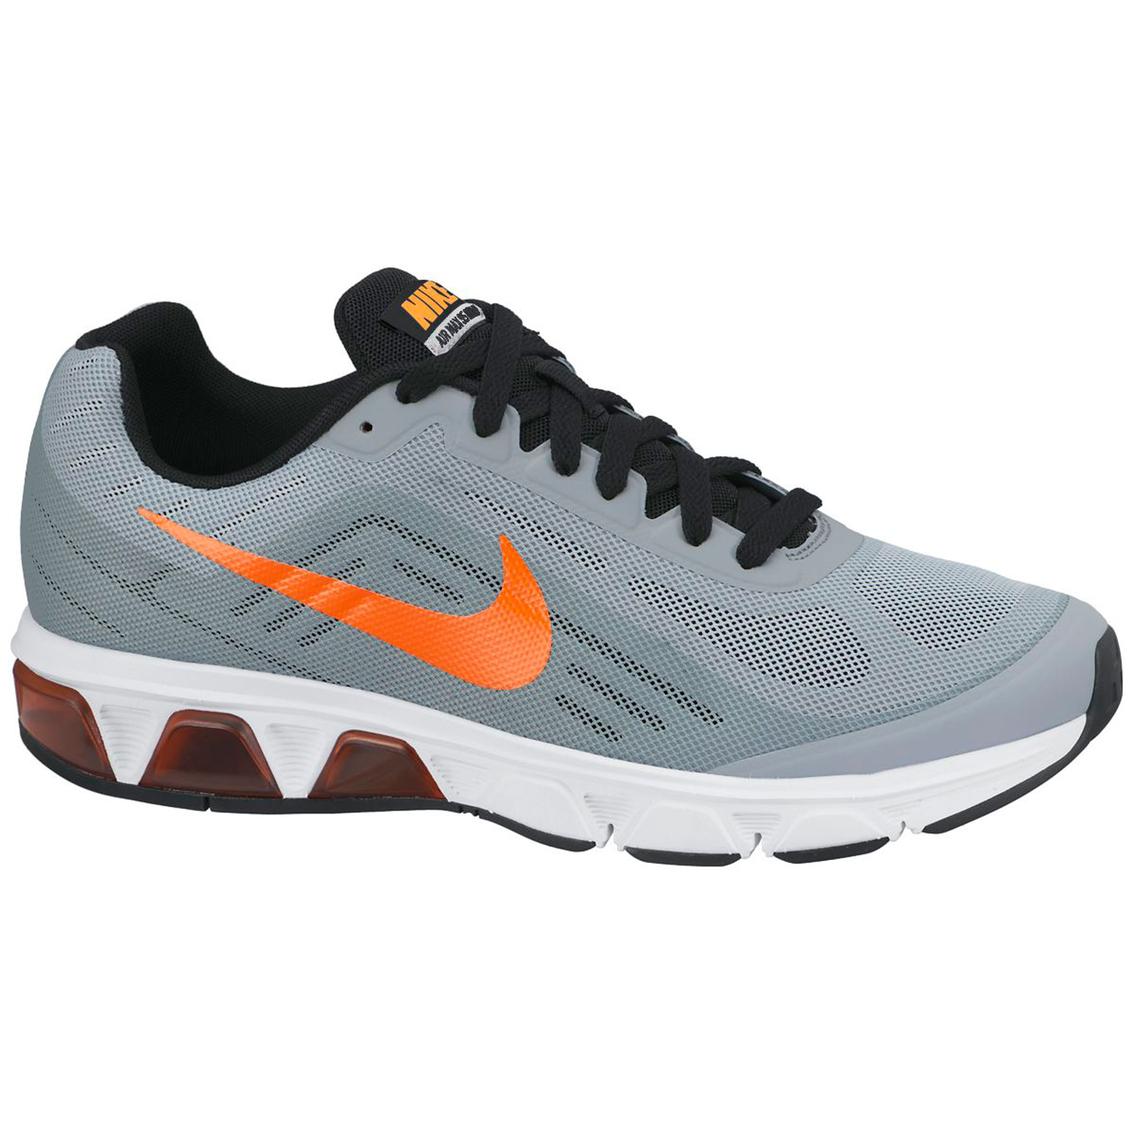 Nike Men s Air Max Boldspeed Running Shoes  d41396cc0d945